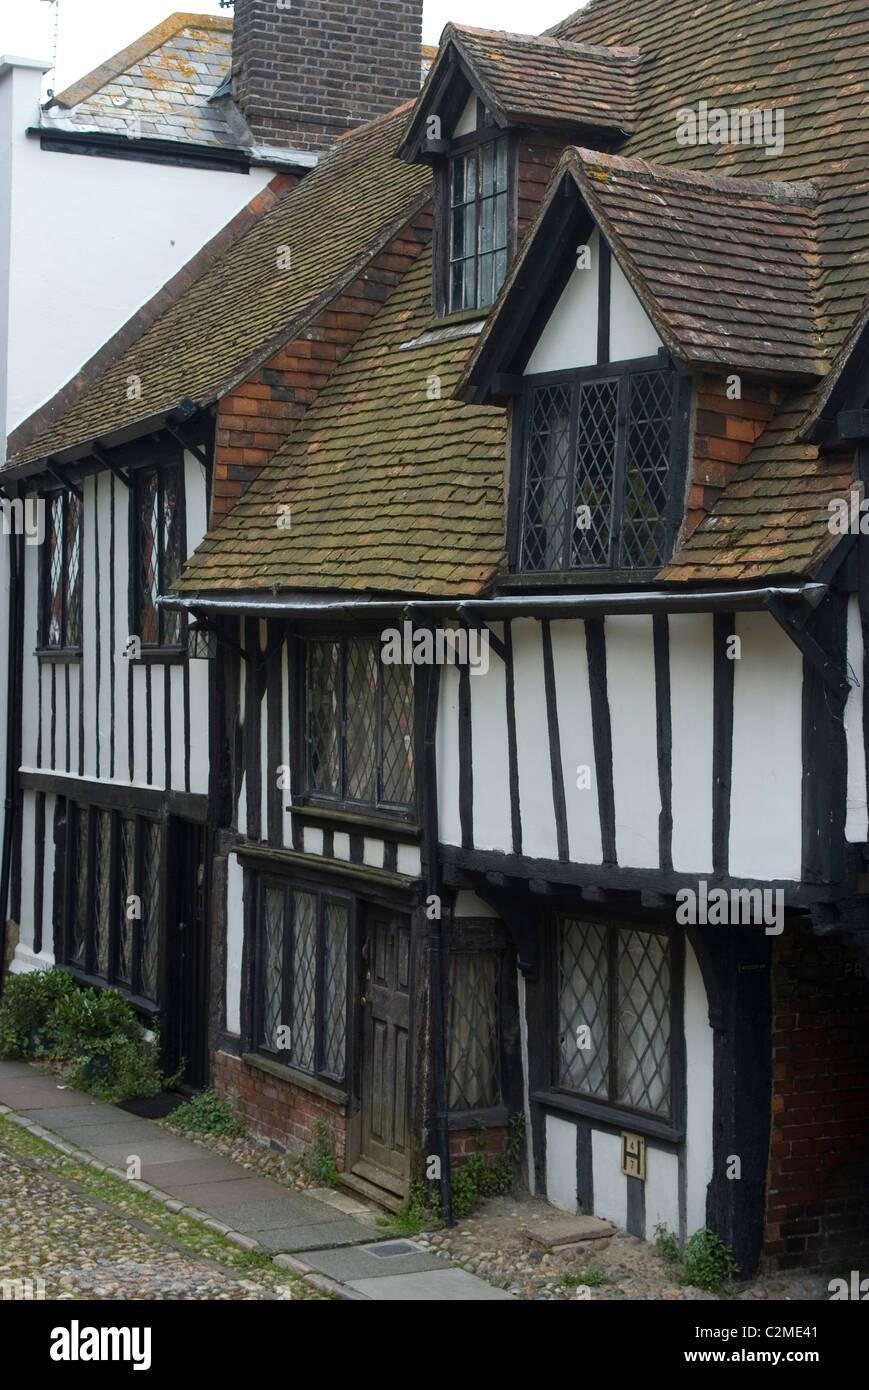 Tudor Houses, Rye, Kent, England - Stock Image